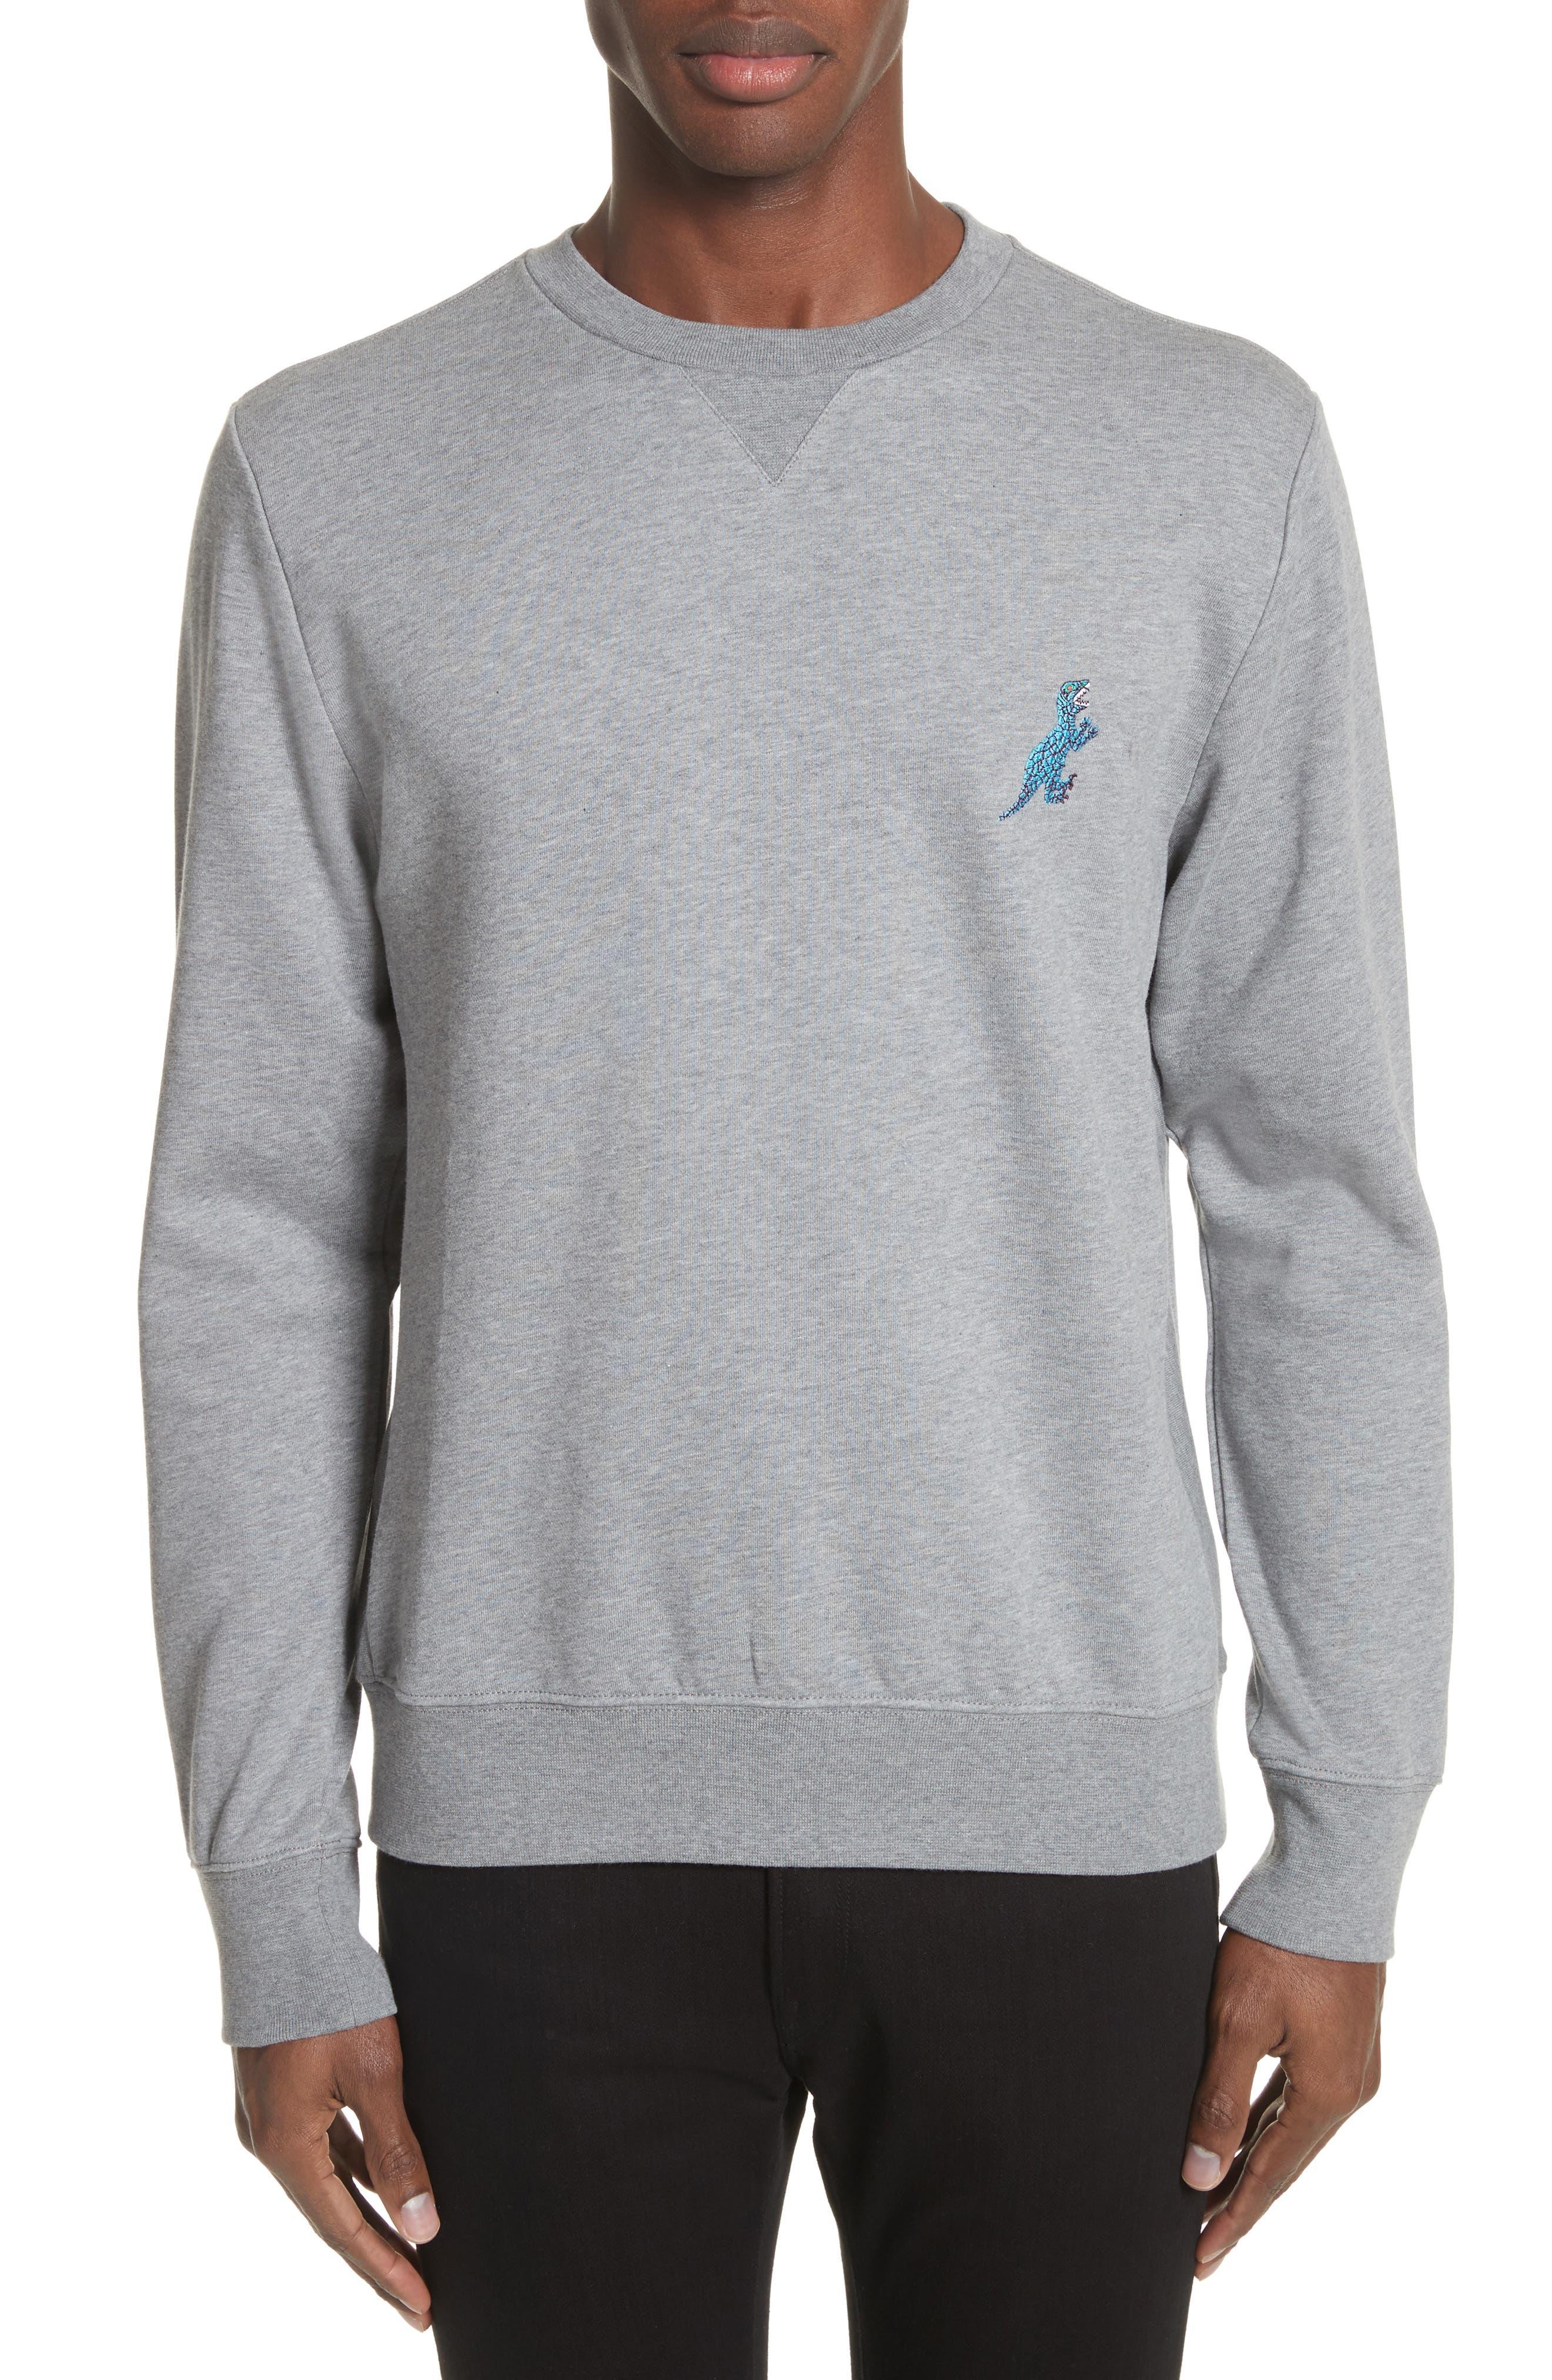 Main Image - PS Paul Smith Dino Embroidered Crewneck Sweatshirt